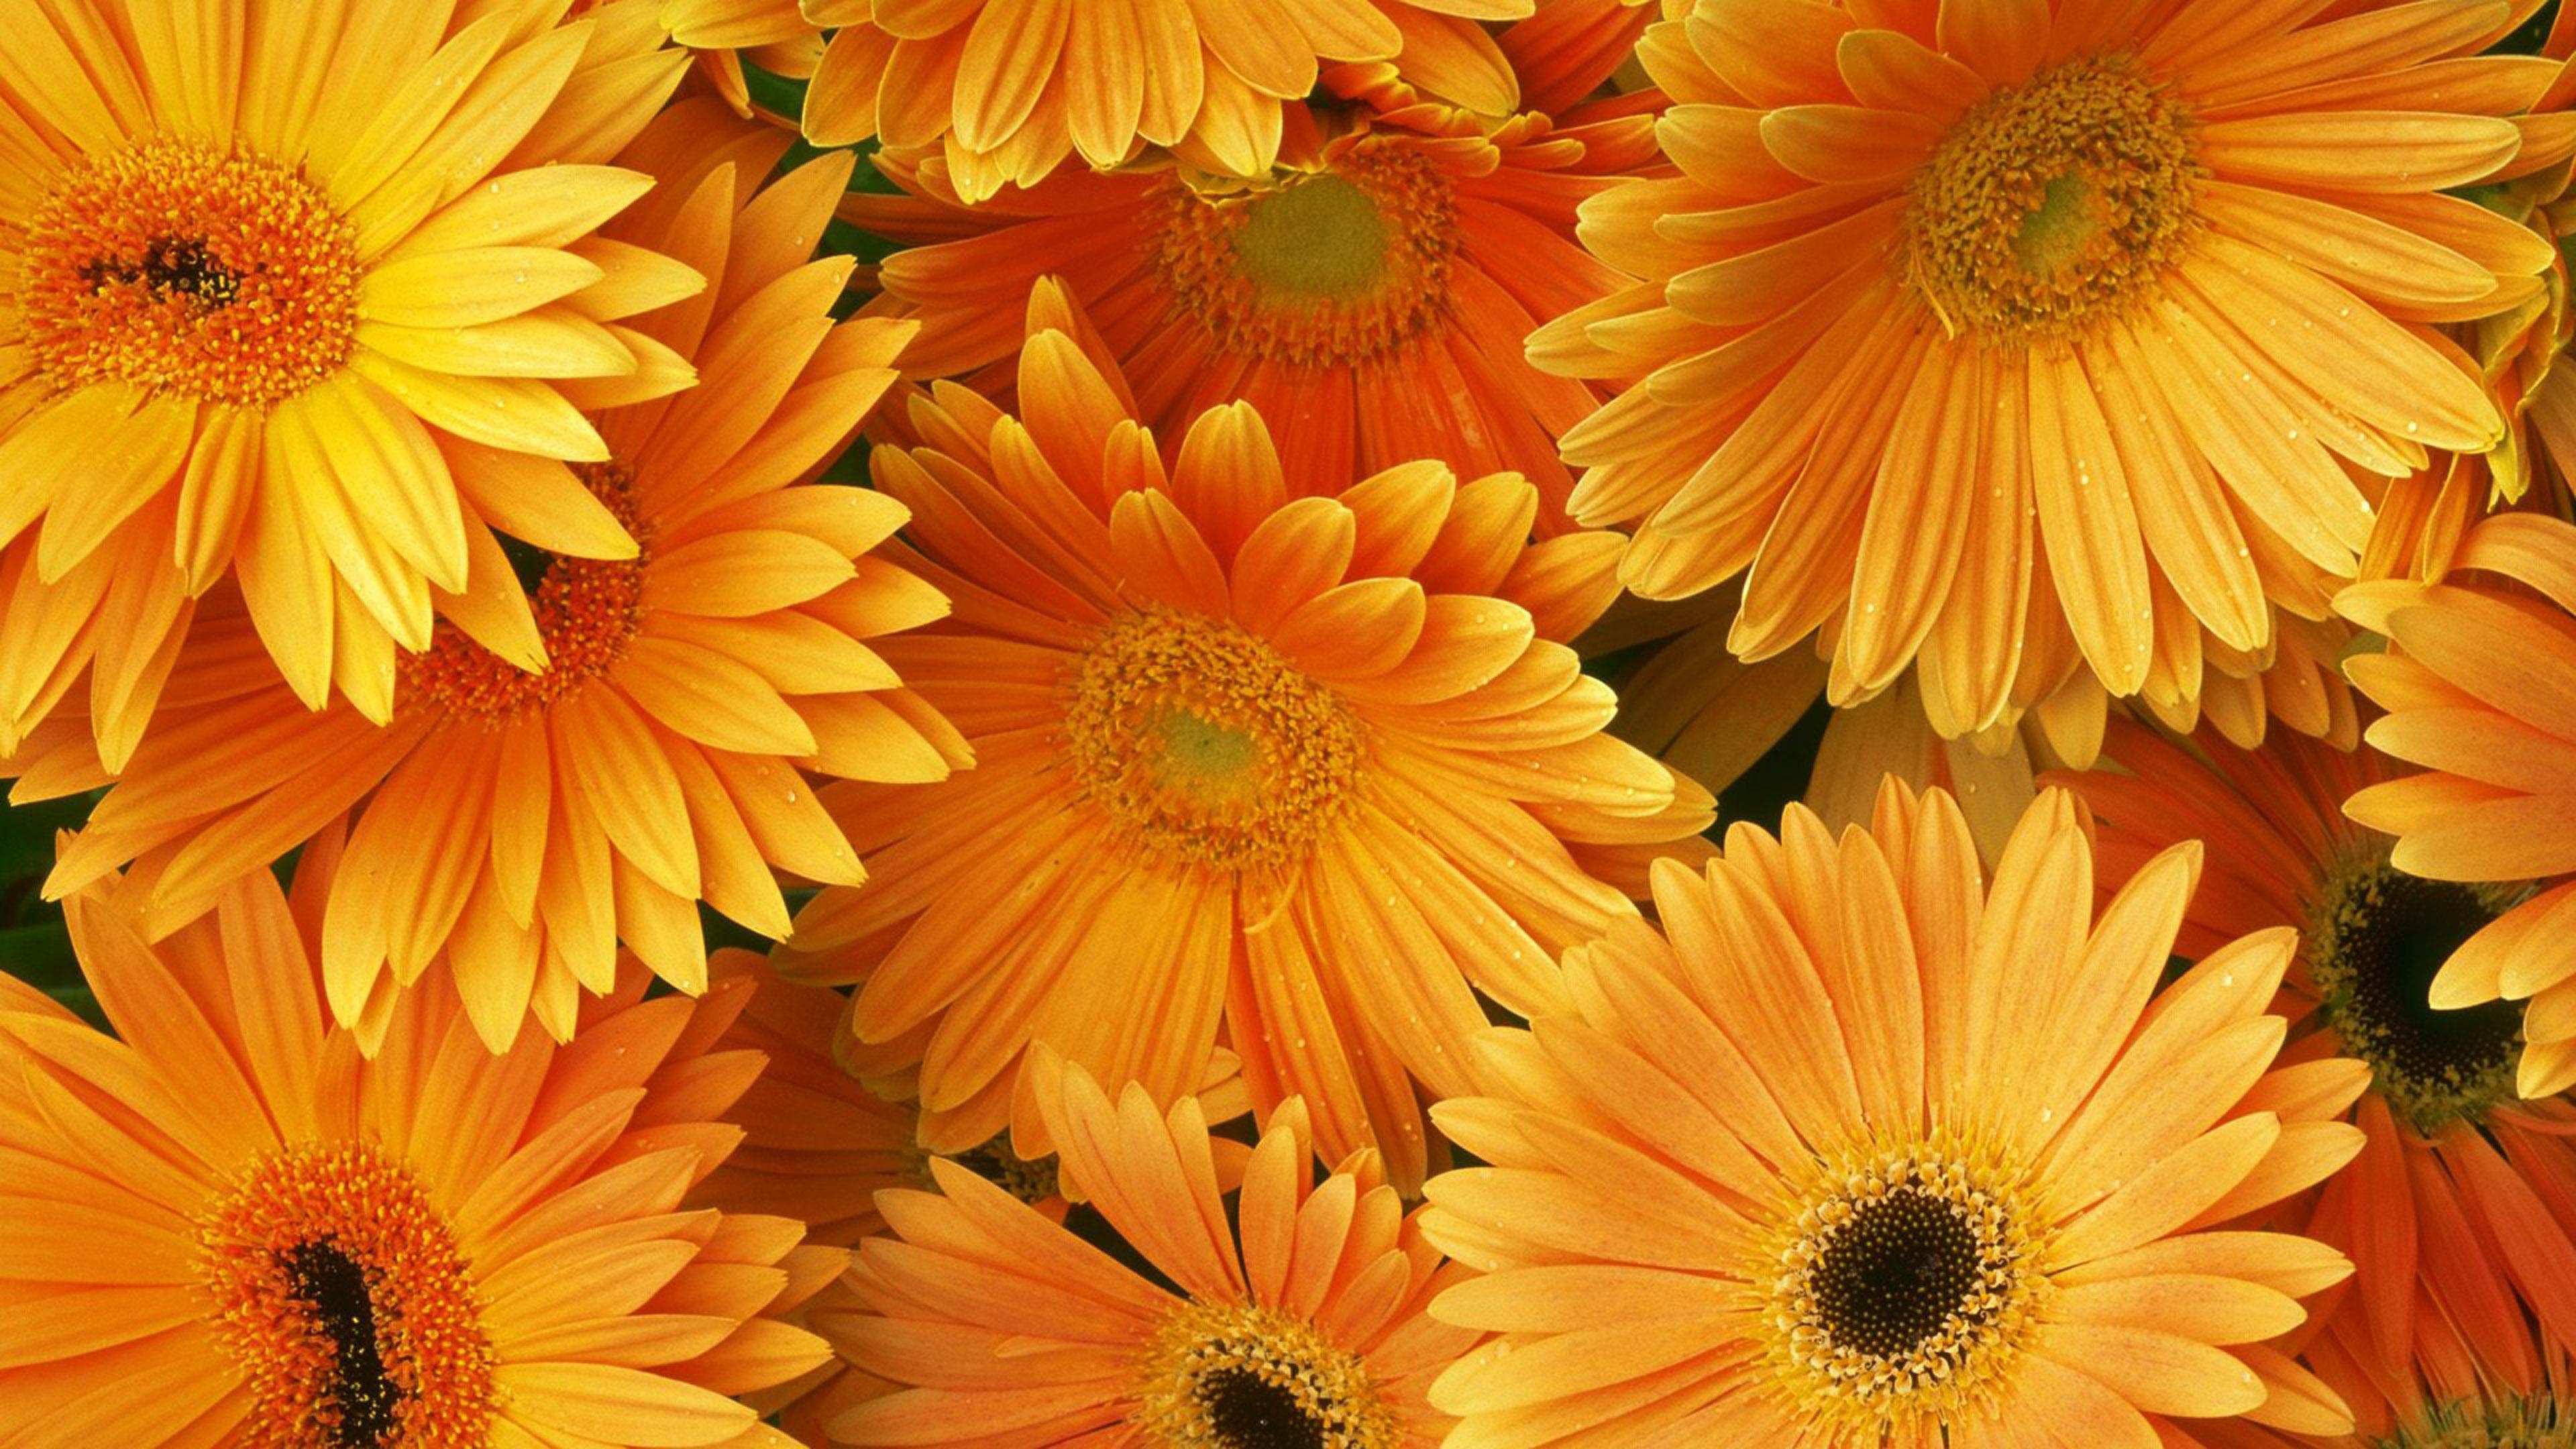 Fall Computer Screen Wallpaper Orange Flowers Hd Desktop Backgrounds Free Download